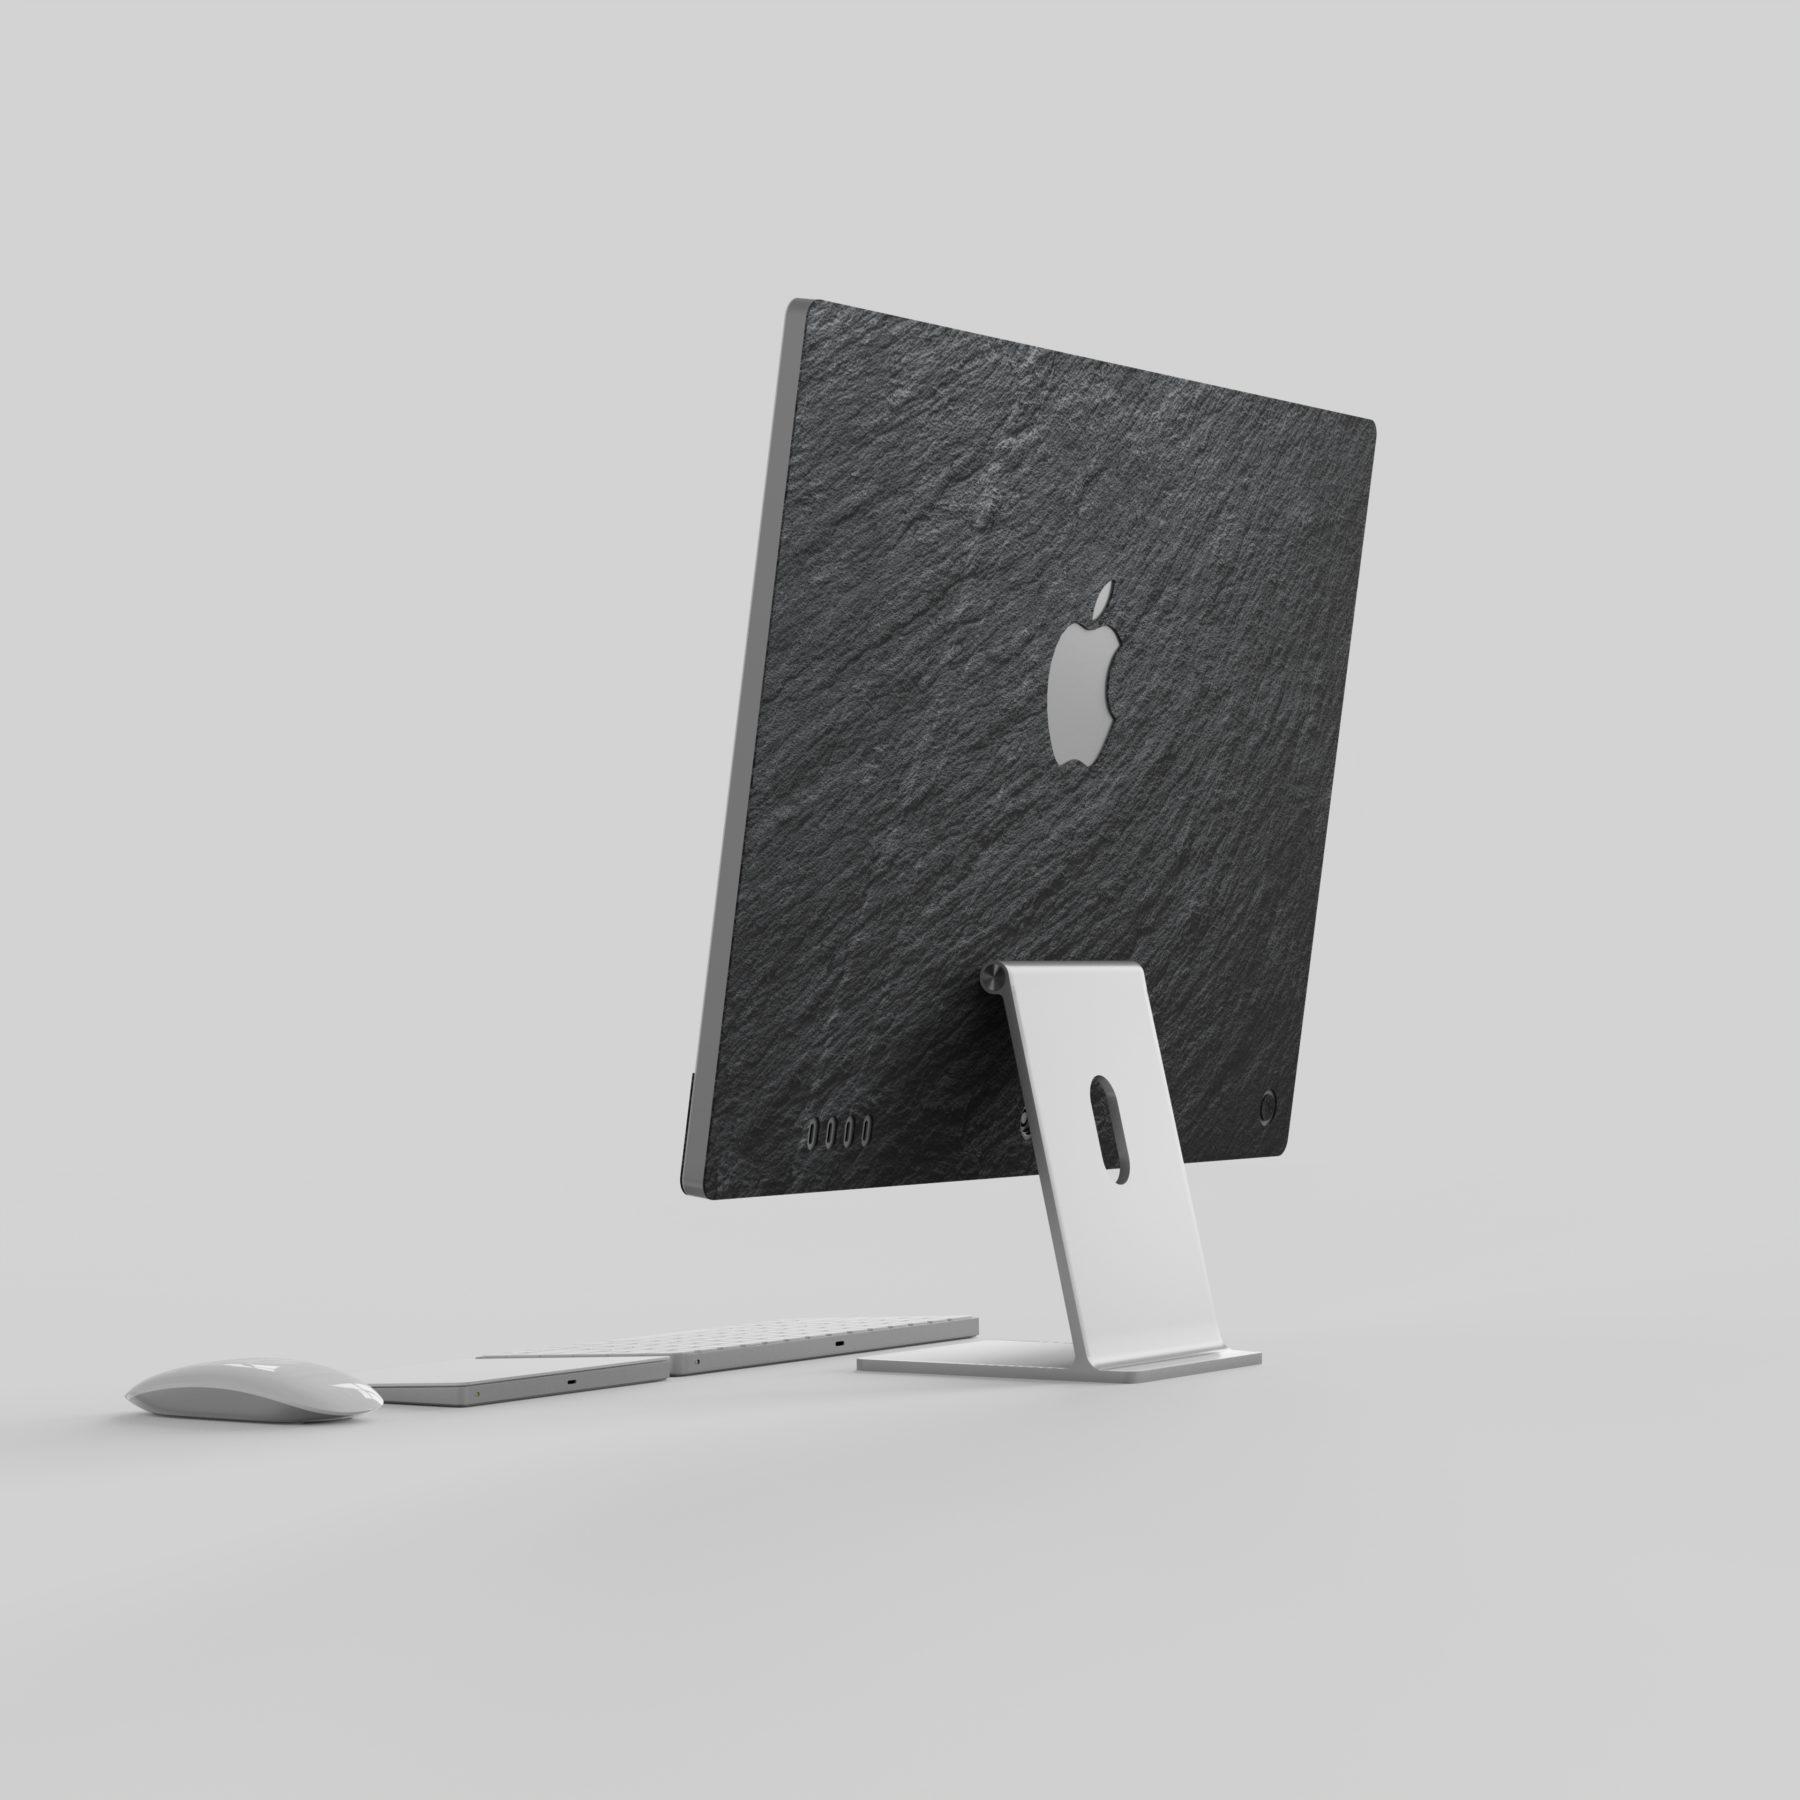 New iMac skin back view with black real slate stone made by Roxxlyn